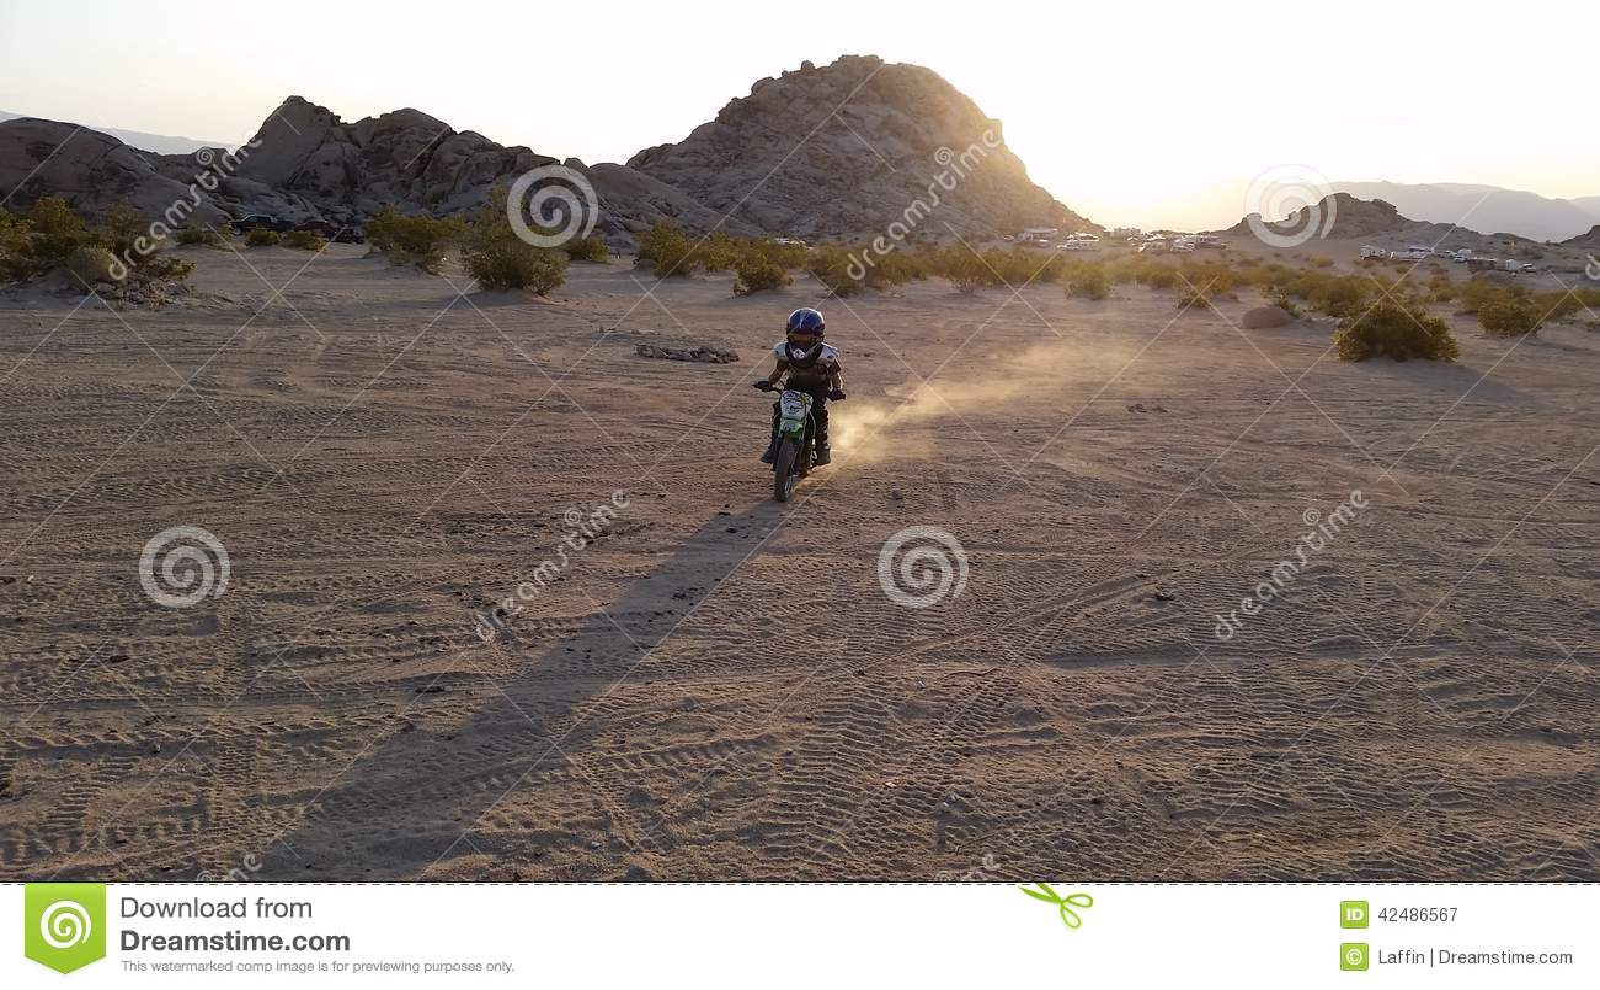 Dirtbike Evening